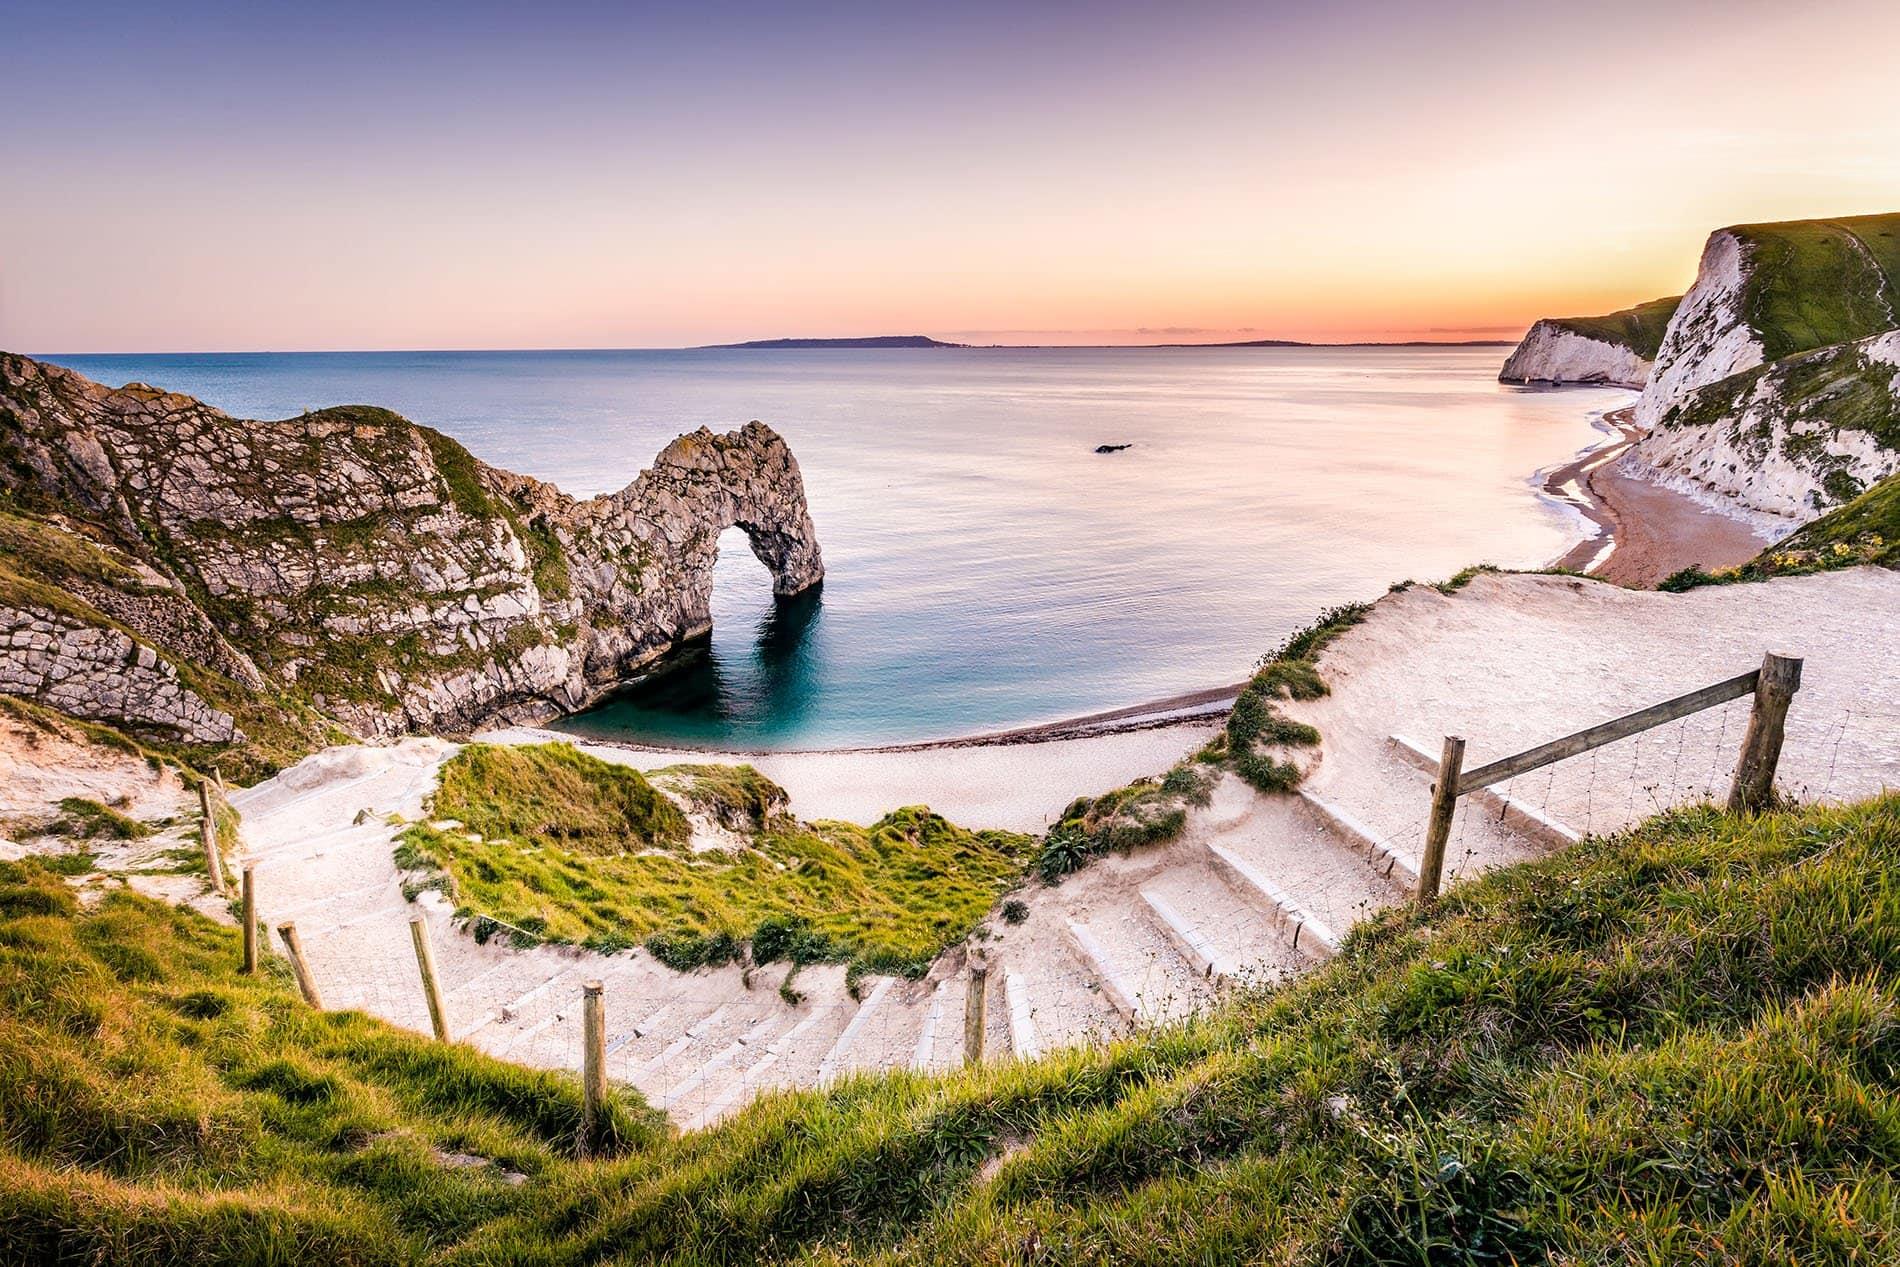 milky way Dorset at sunset